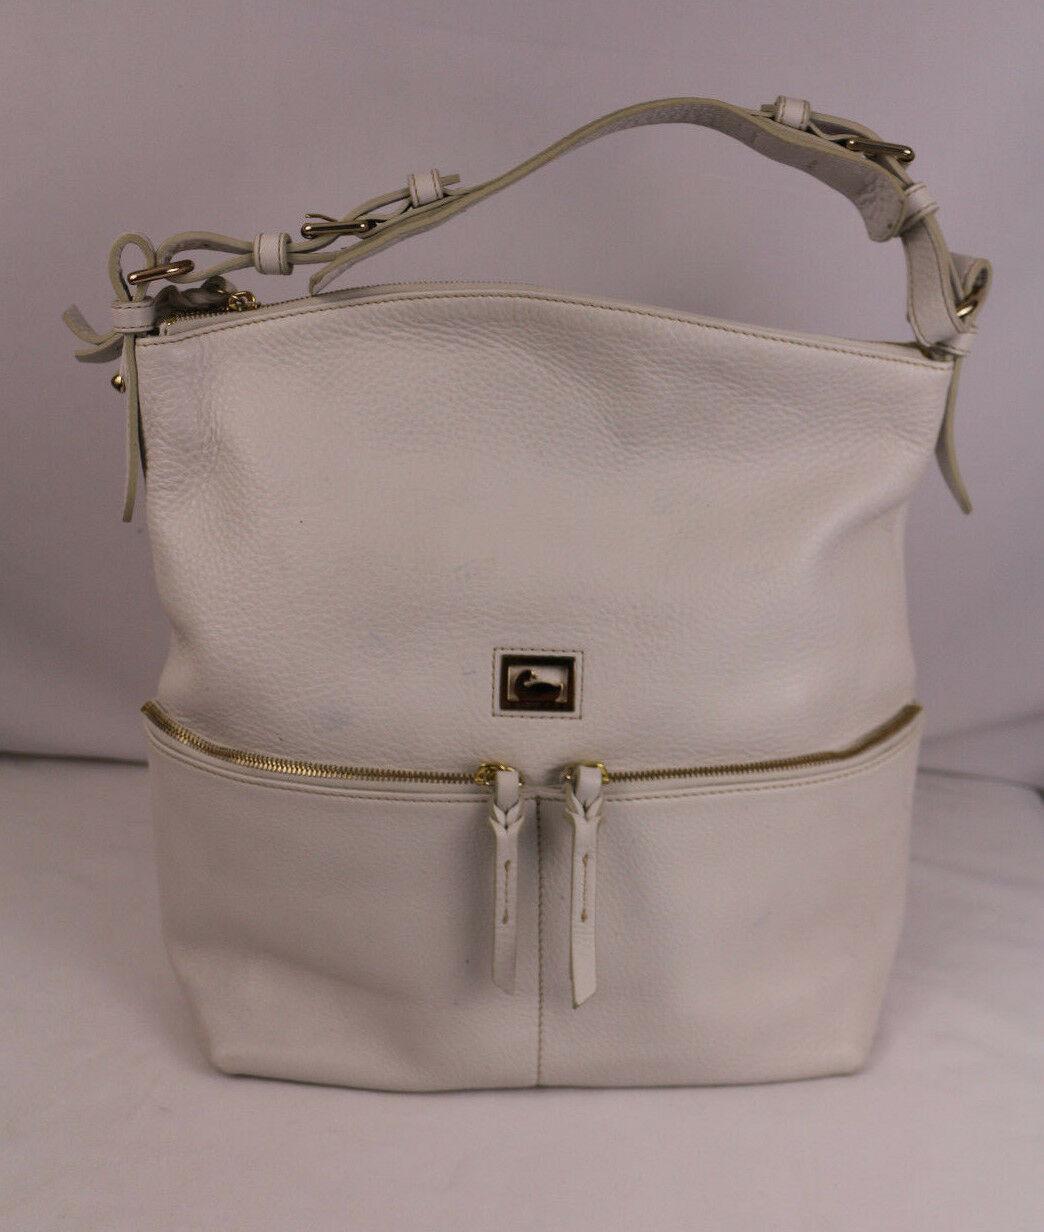 Dooney & Bourke Dillen Leather Medium Zipper Pocket Sac Hobo Pre-Owned W/Dustbag - $84.66